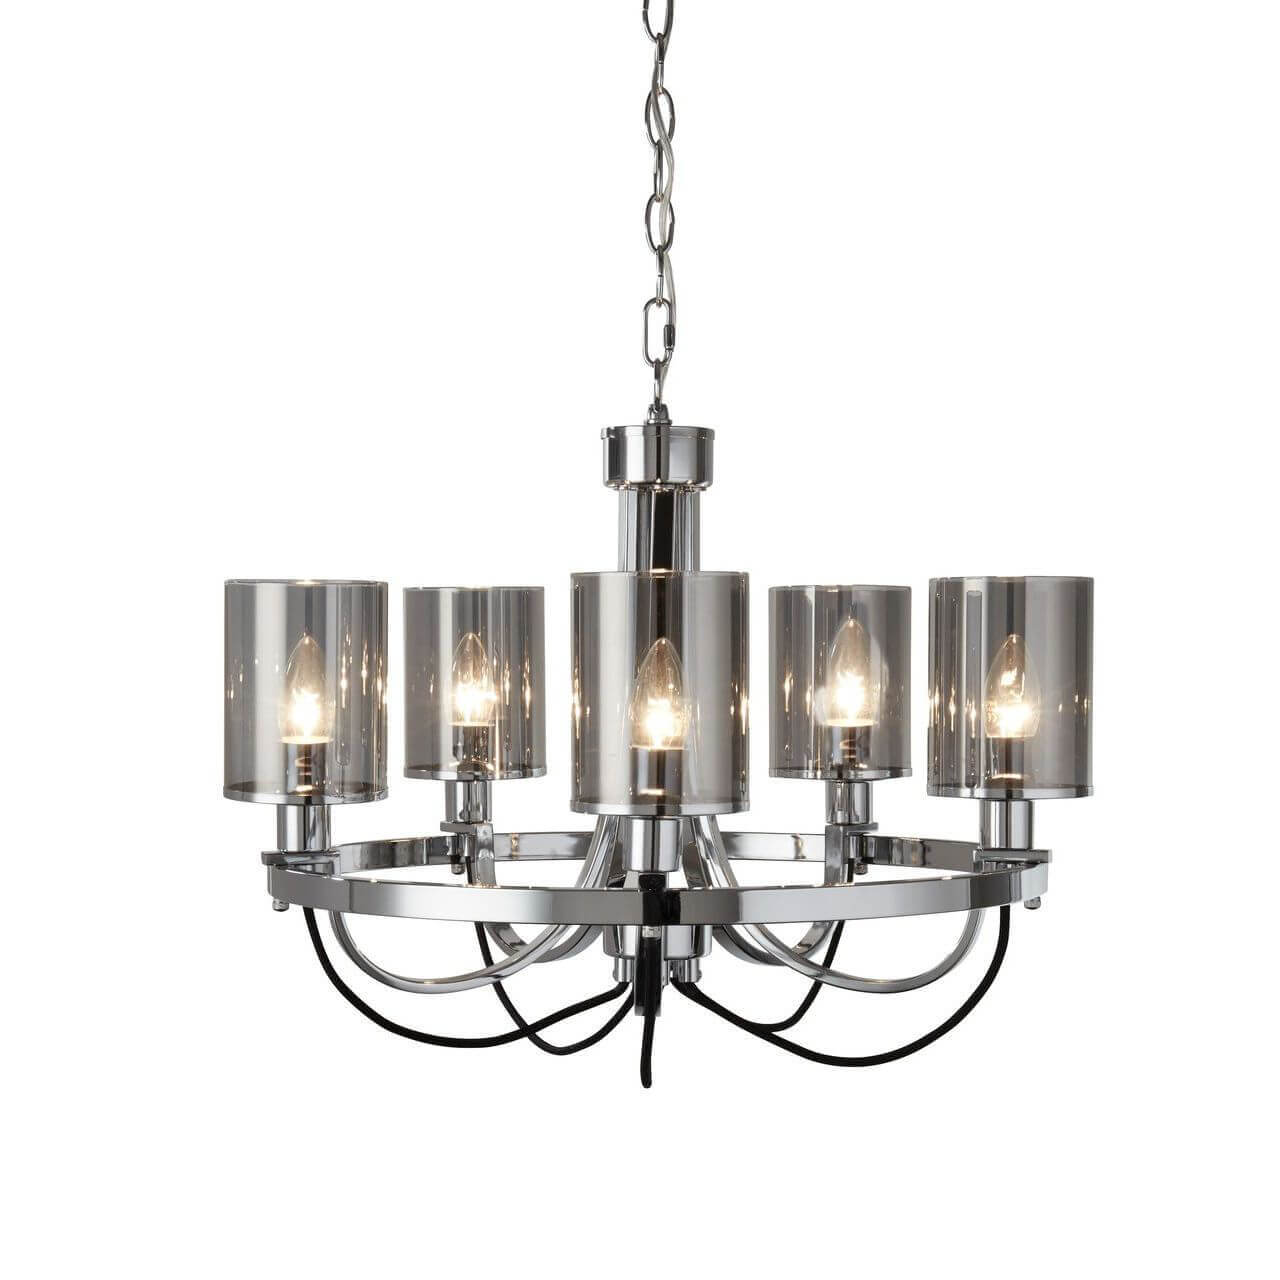 Люстра Arte Lamp A2995LM-5CC Ombra